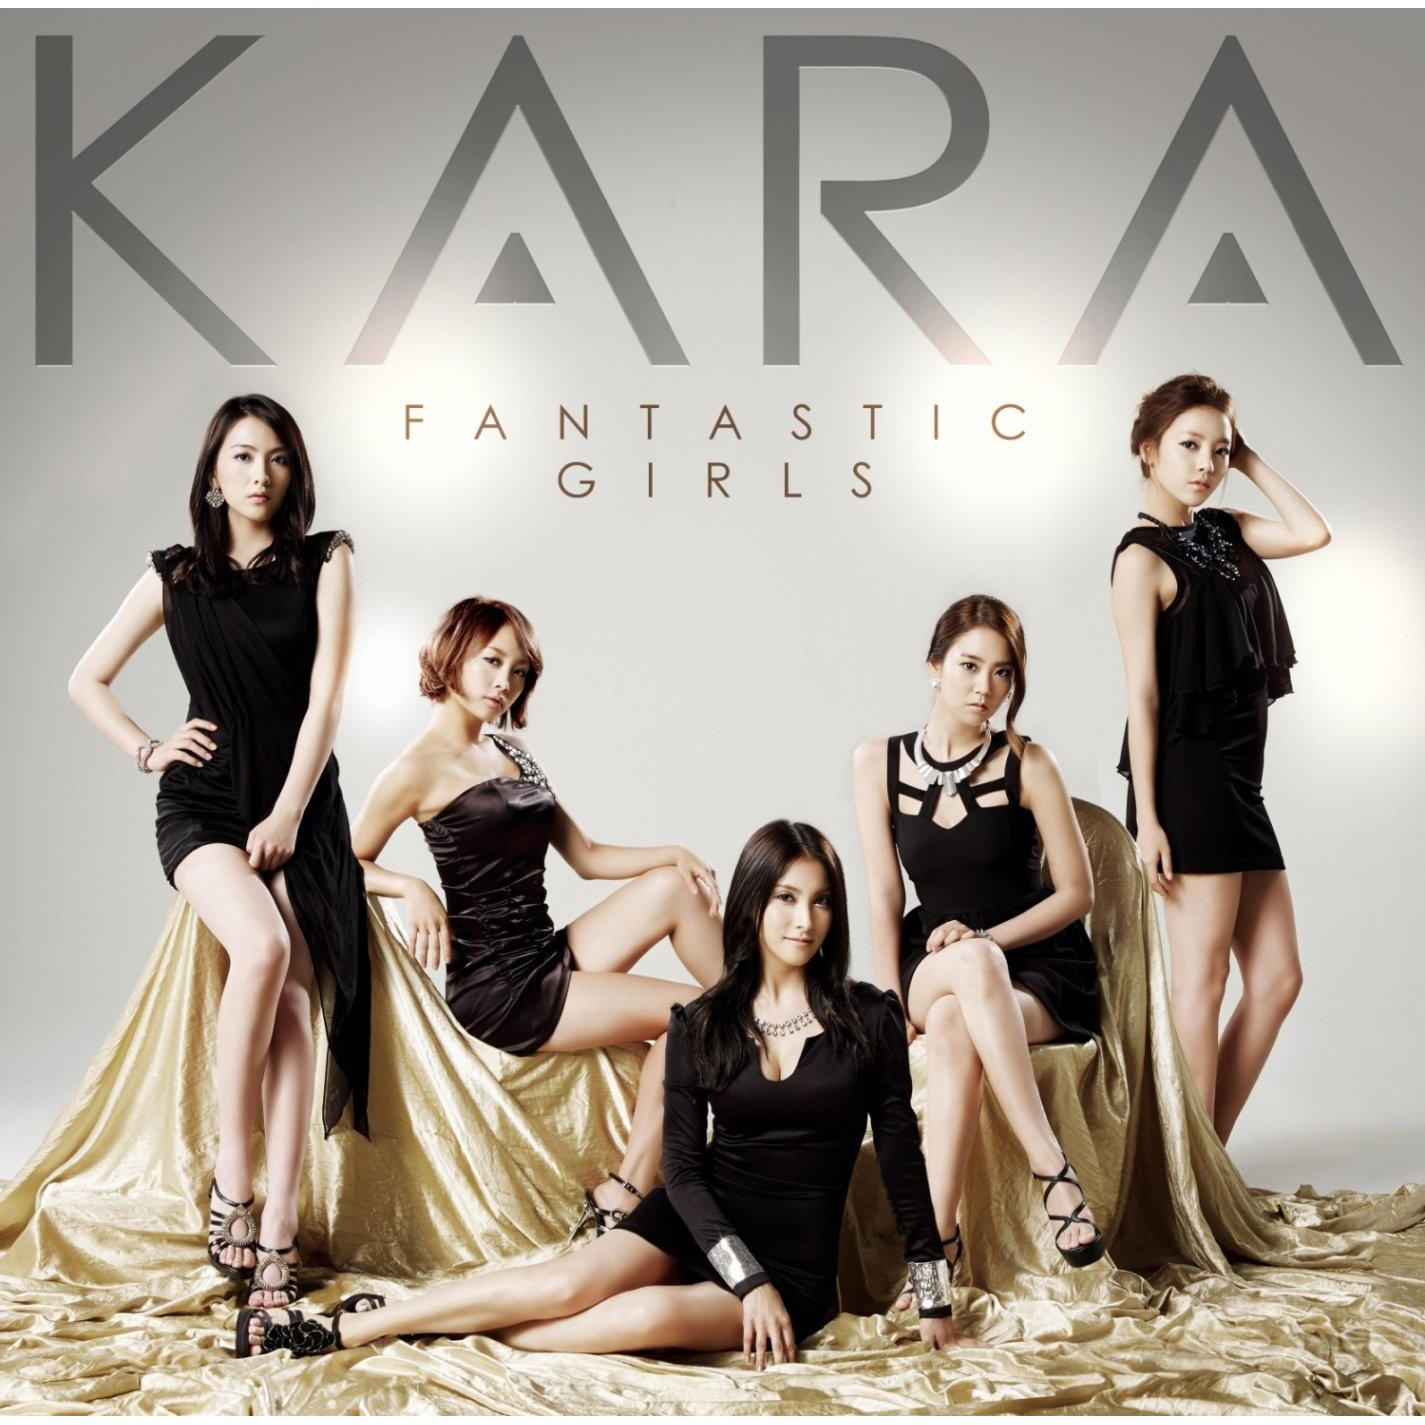 Kara are fantastic girls in japan seoulbeats 20130904seoulbeatskara2 thecheapjerseys Gallery